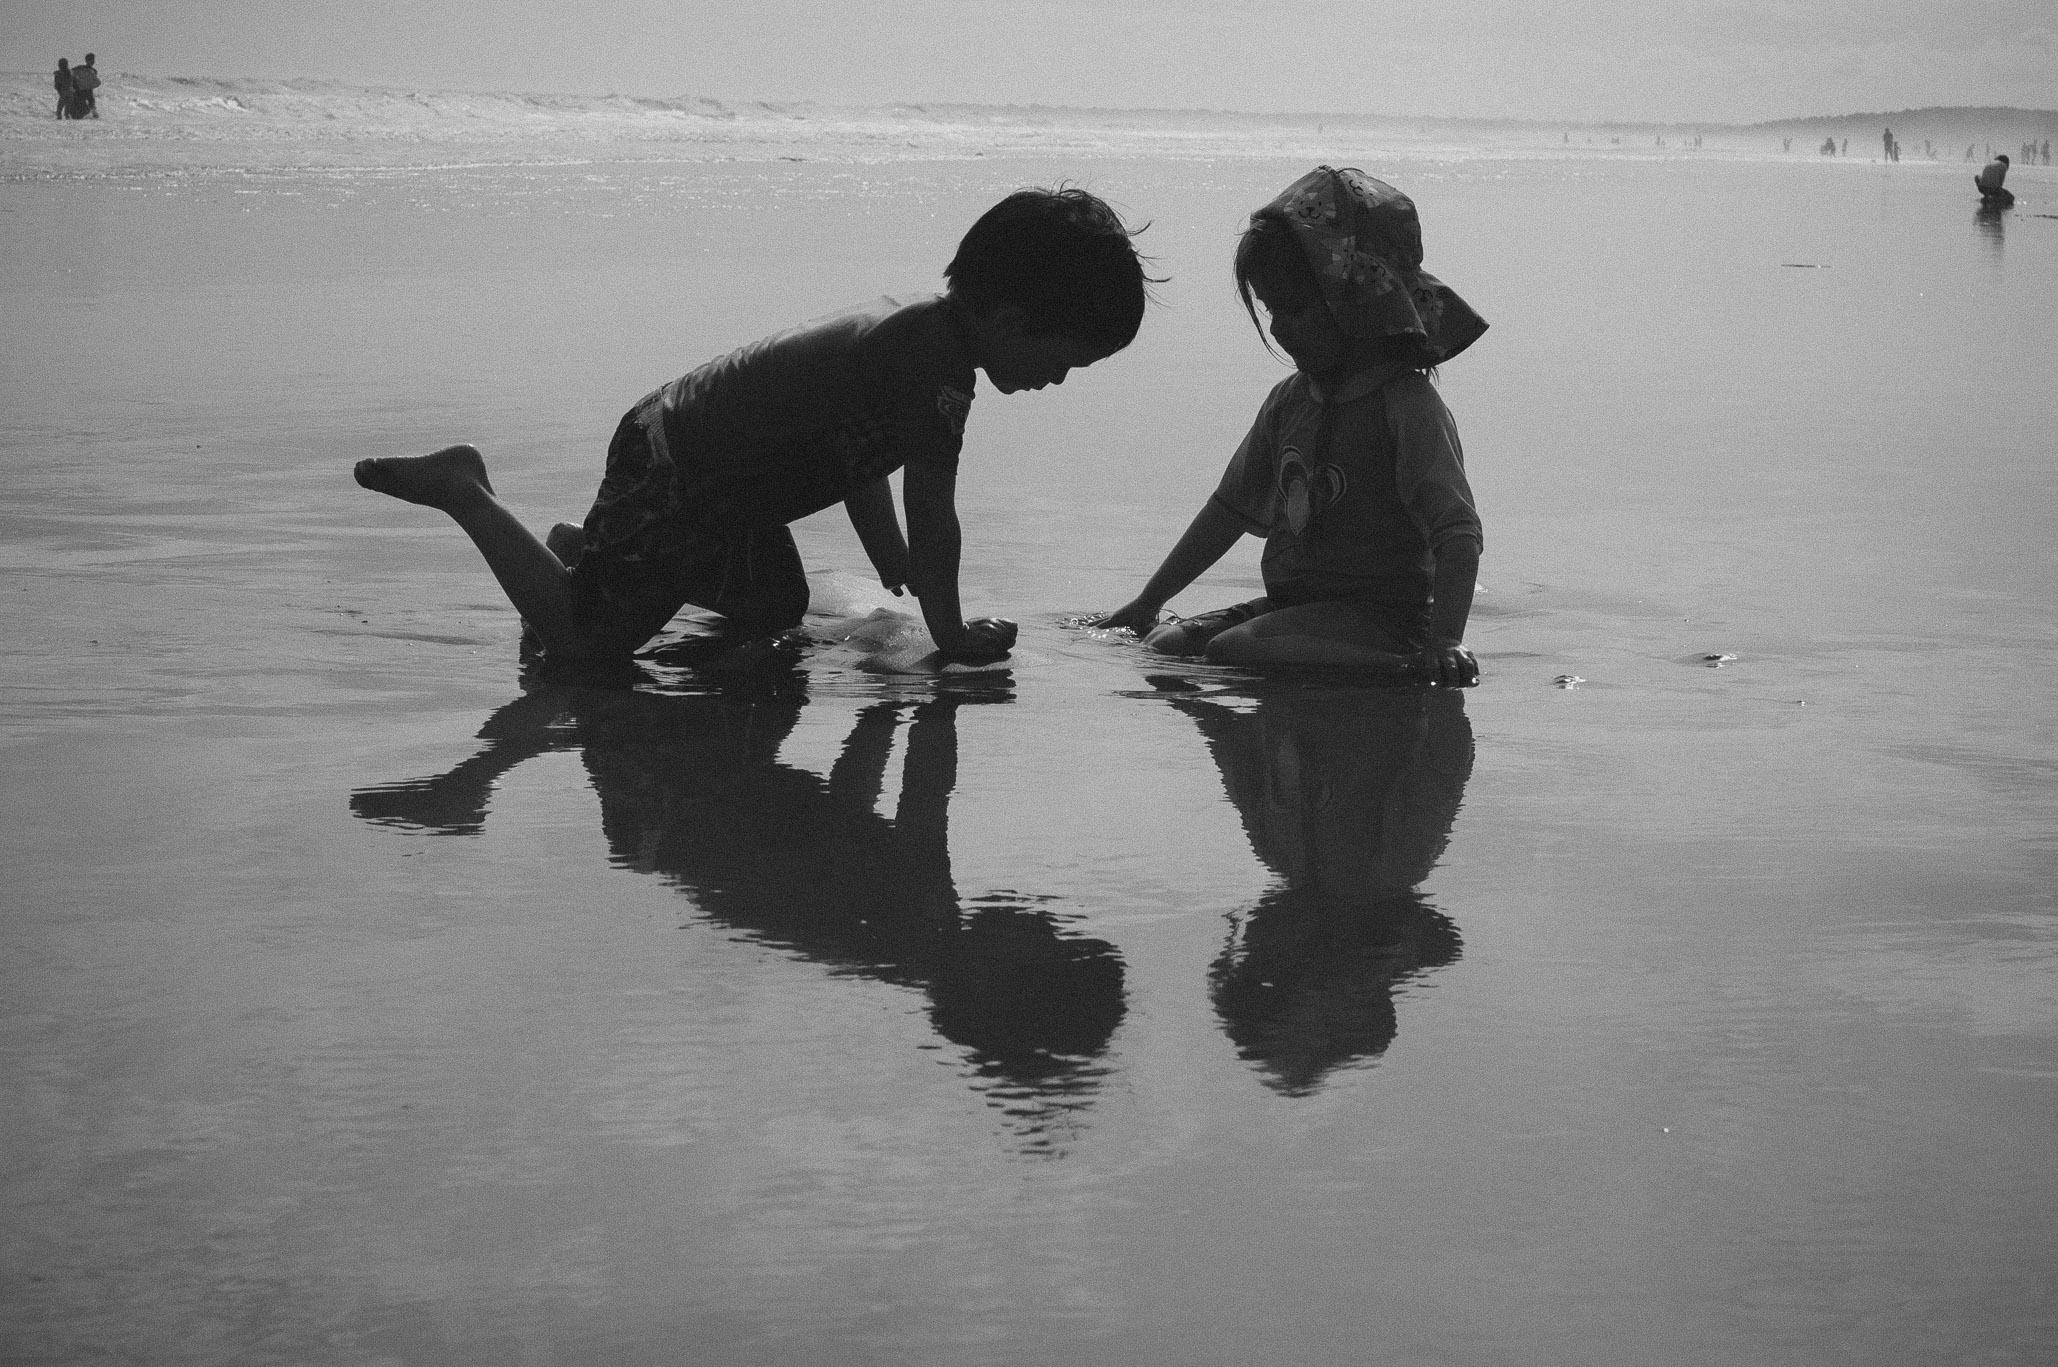 camarillo family photo beach.jpg